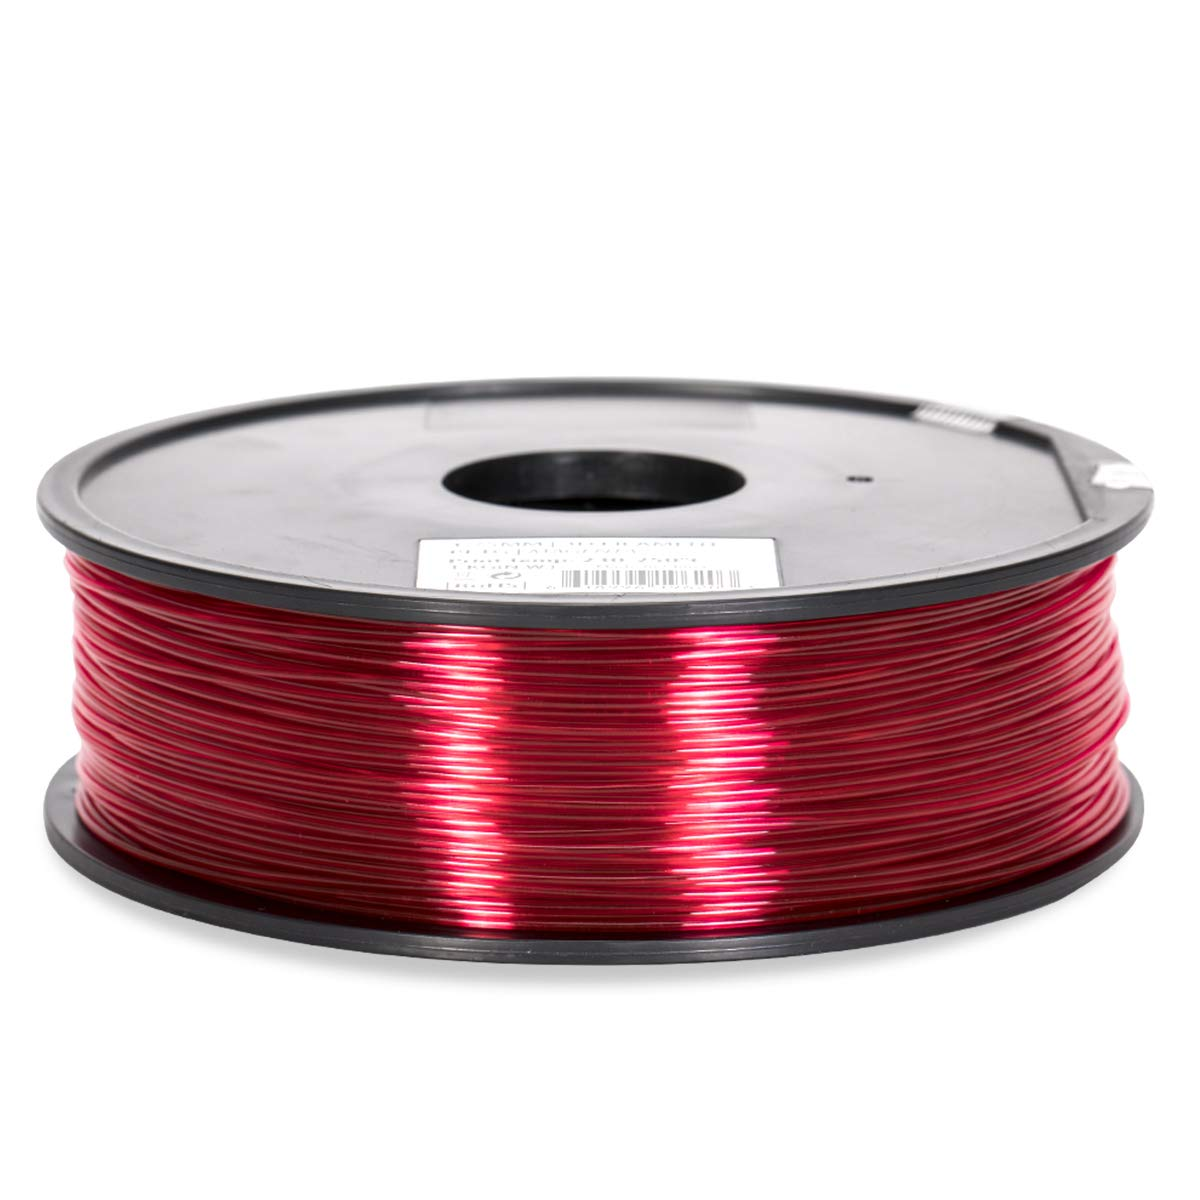 PETG Filament - 1.75 - Red Translucent - Inland